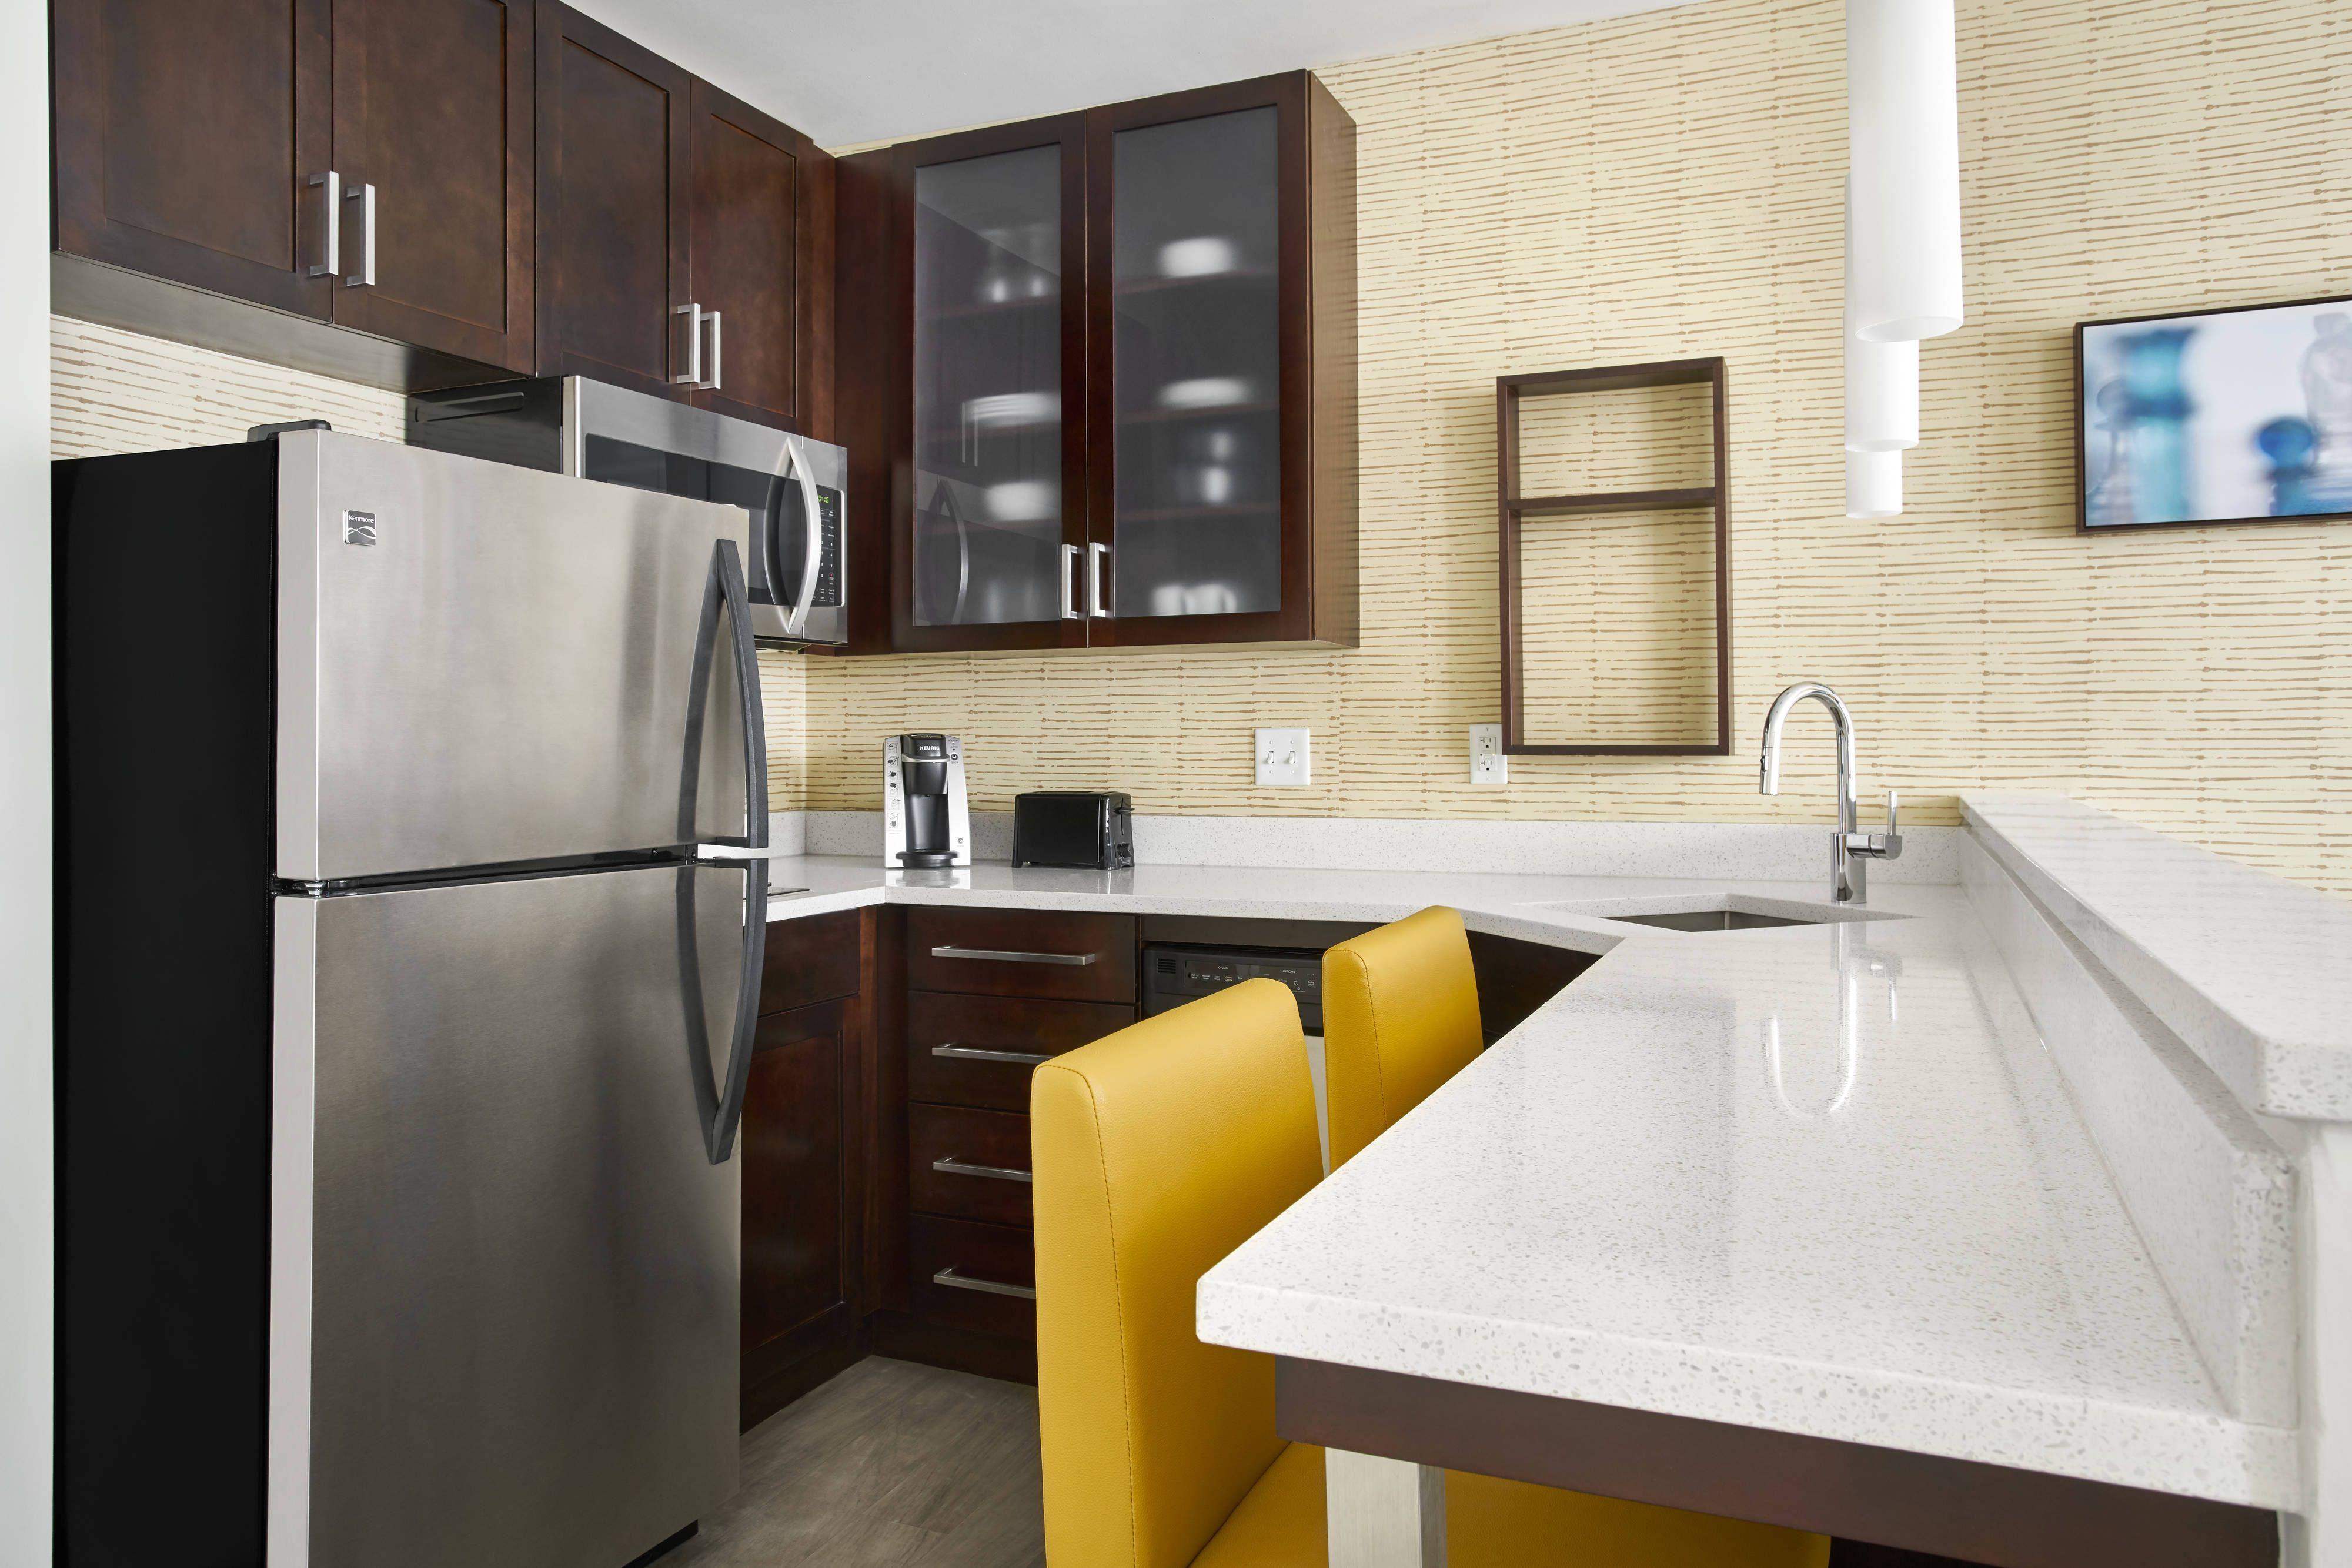 Residence Inn Lynchburg Suite Kitchen Visiting Guestroom